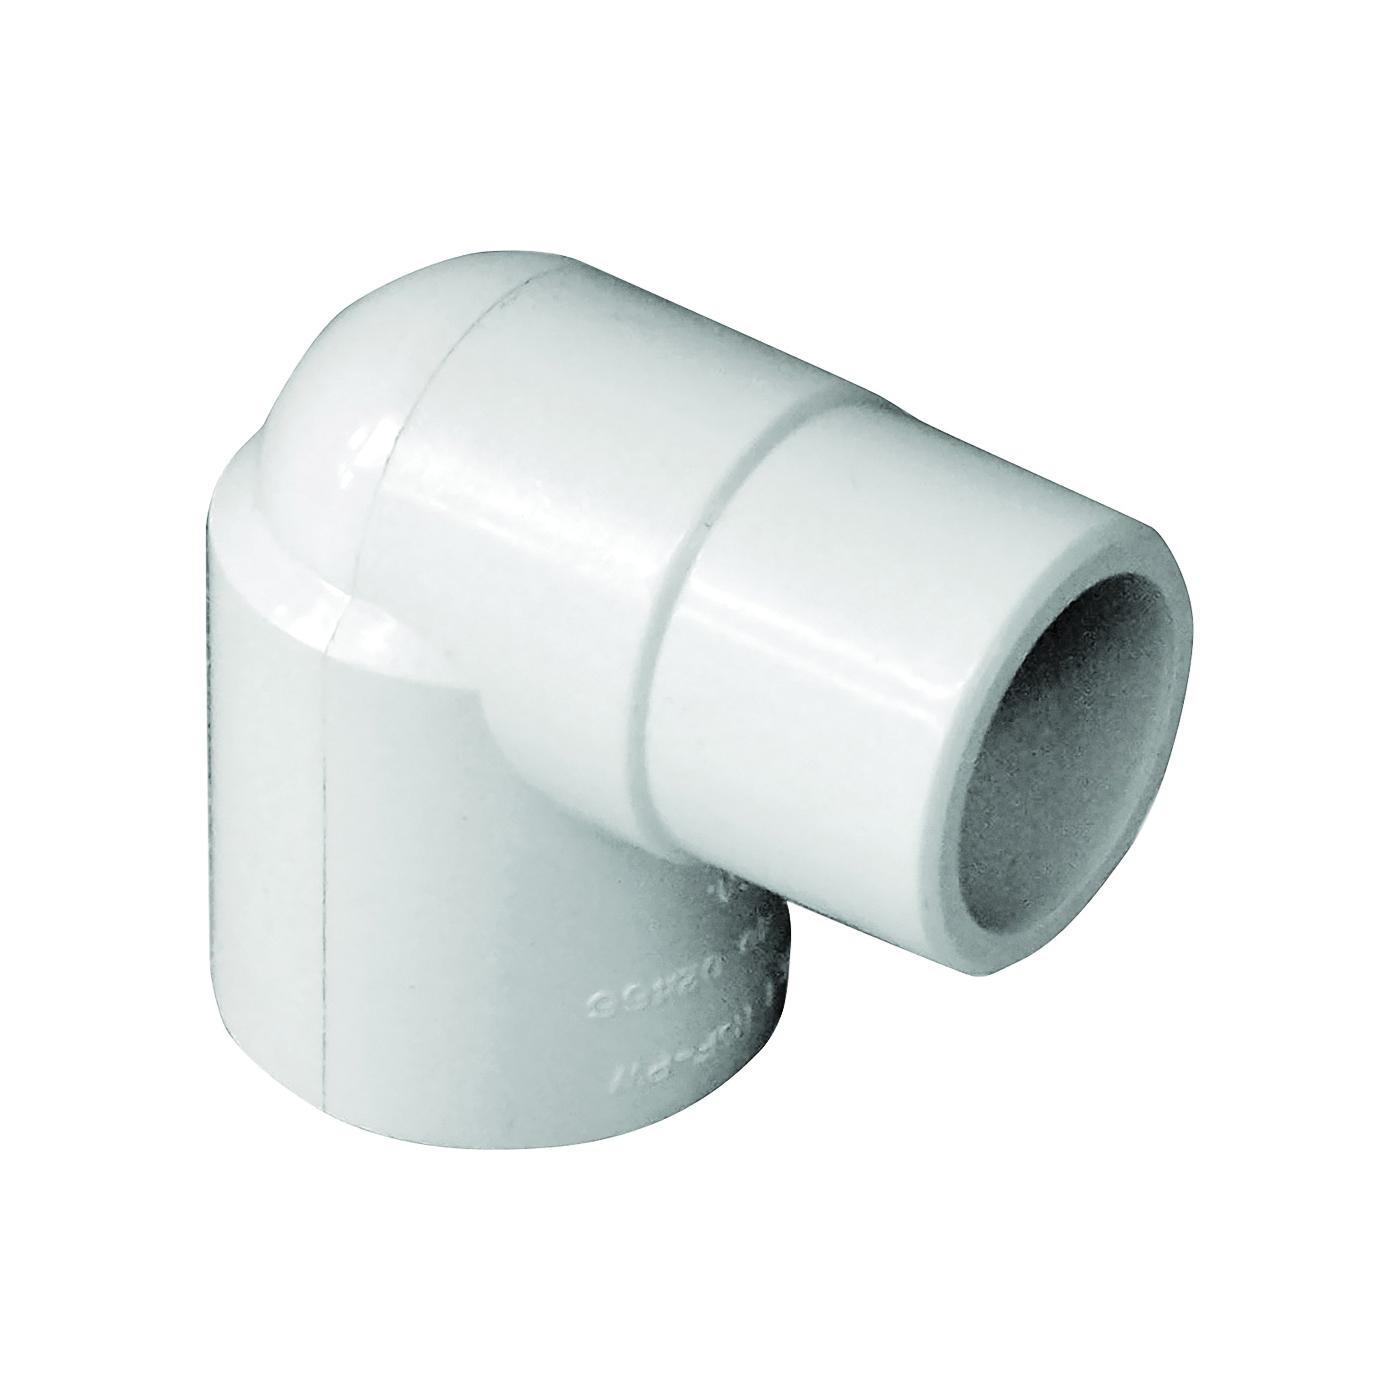 Picture of GENOVA 300 32907 Street Pipe Elbow, 3/4 in, Slip x Spigot, 90 deg Angle, PVC, White, SCH 40 Schedule